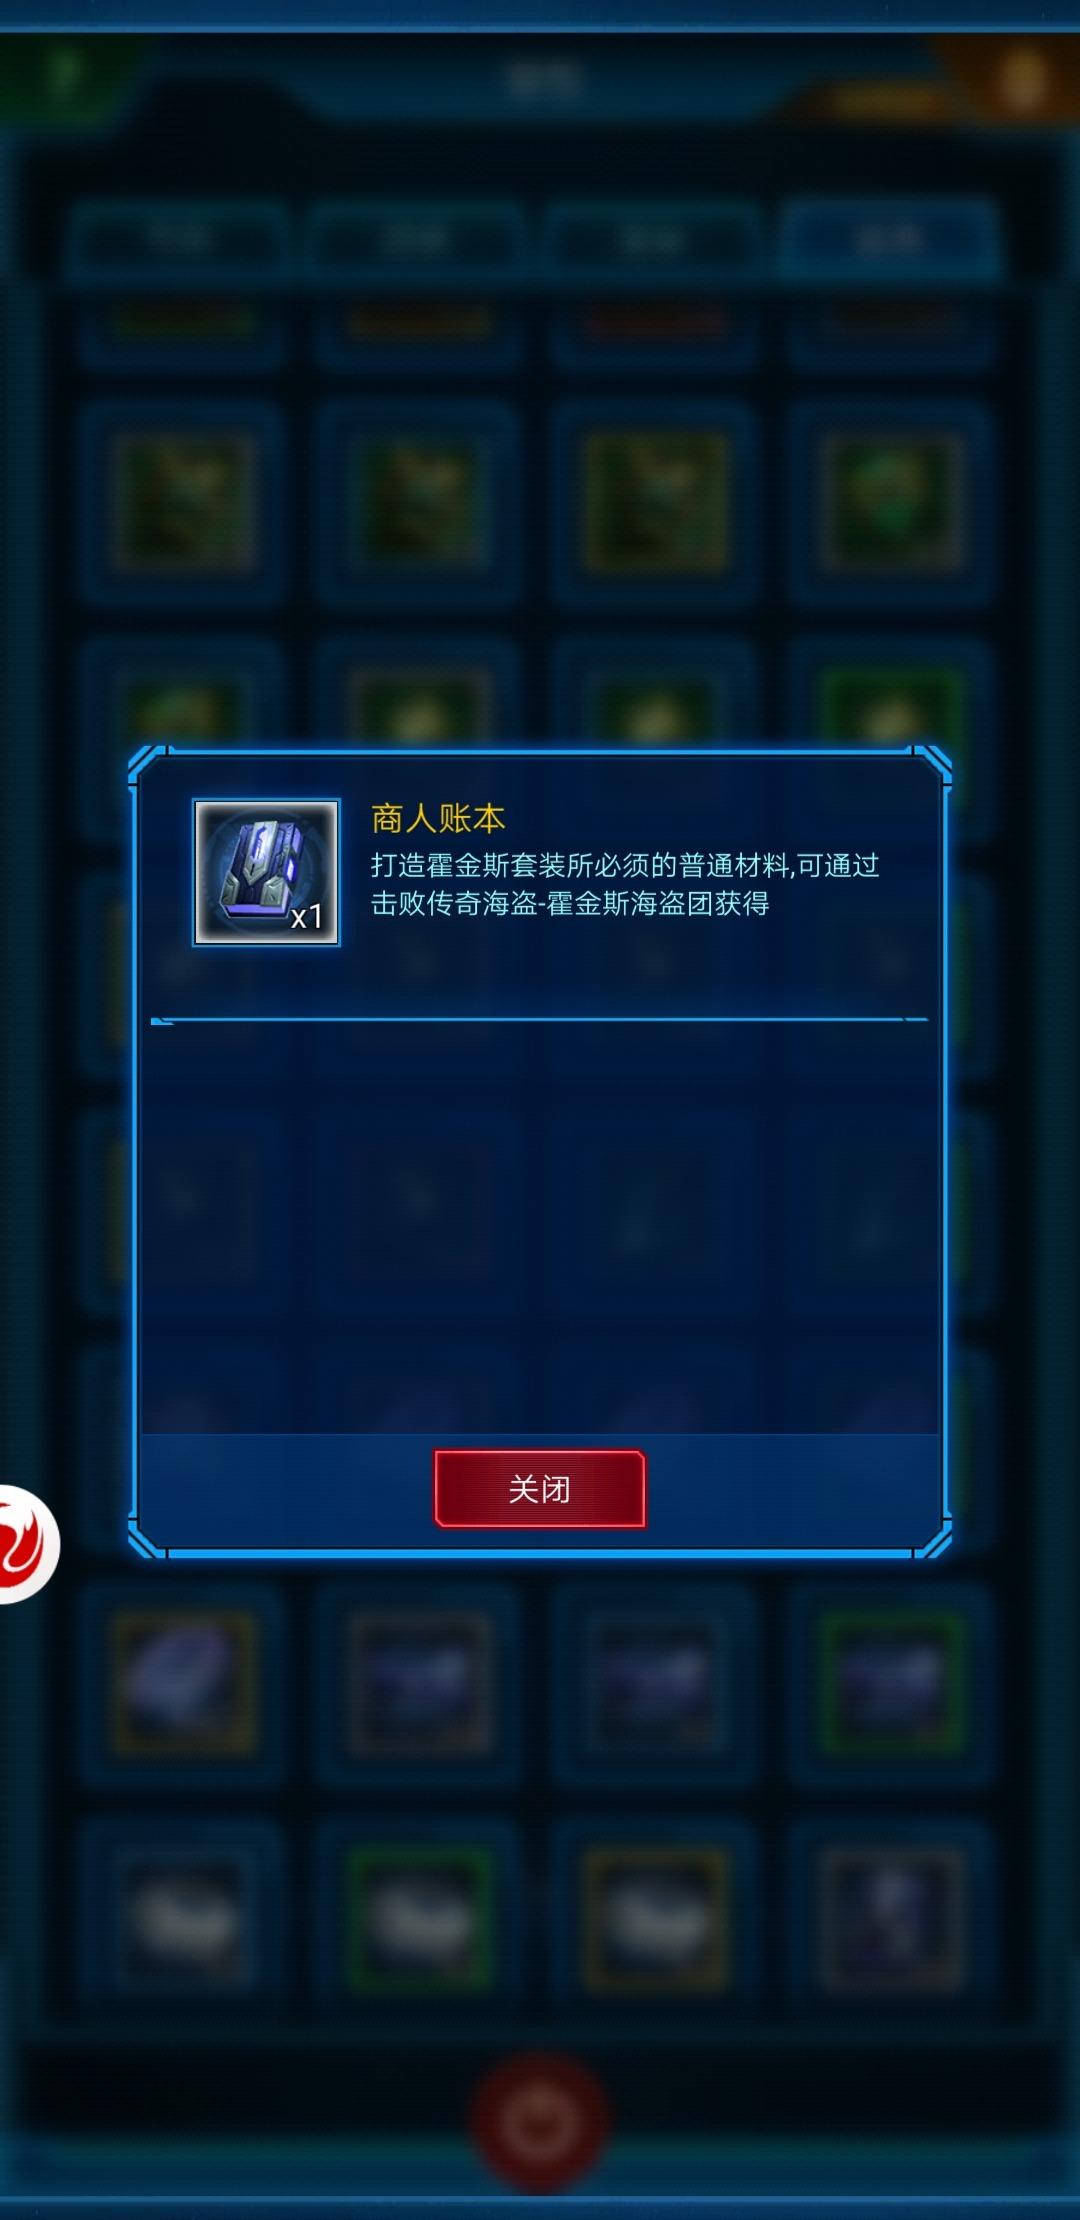 Screenshot_20190607_103205_com.jedigames.p16s.luobo.jpg